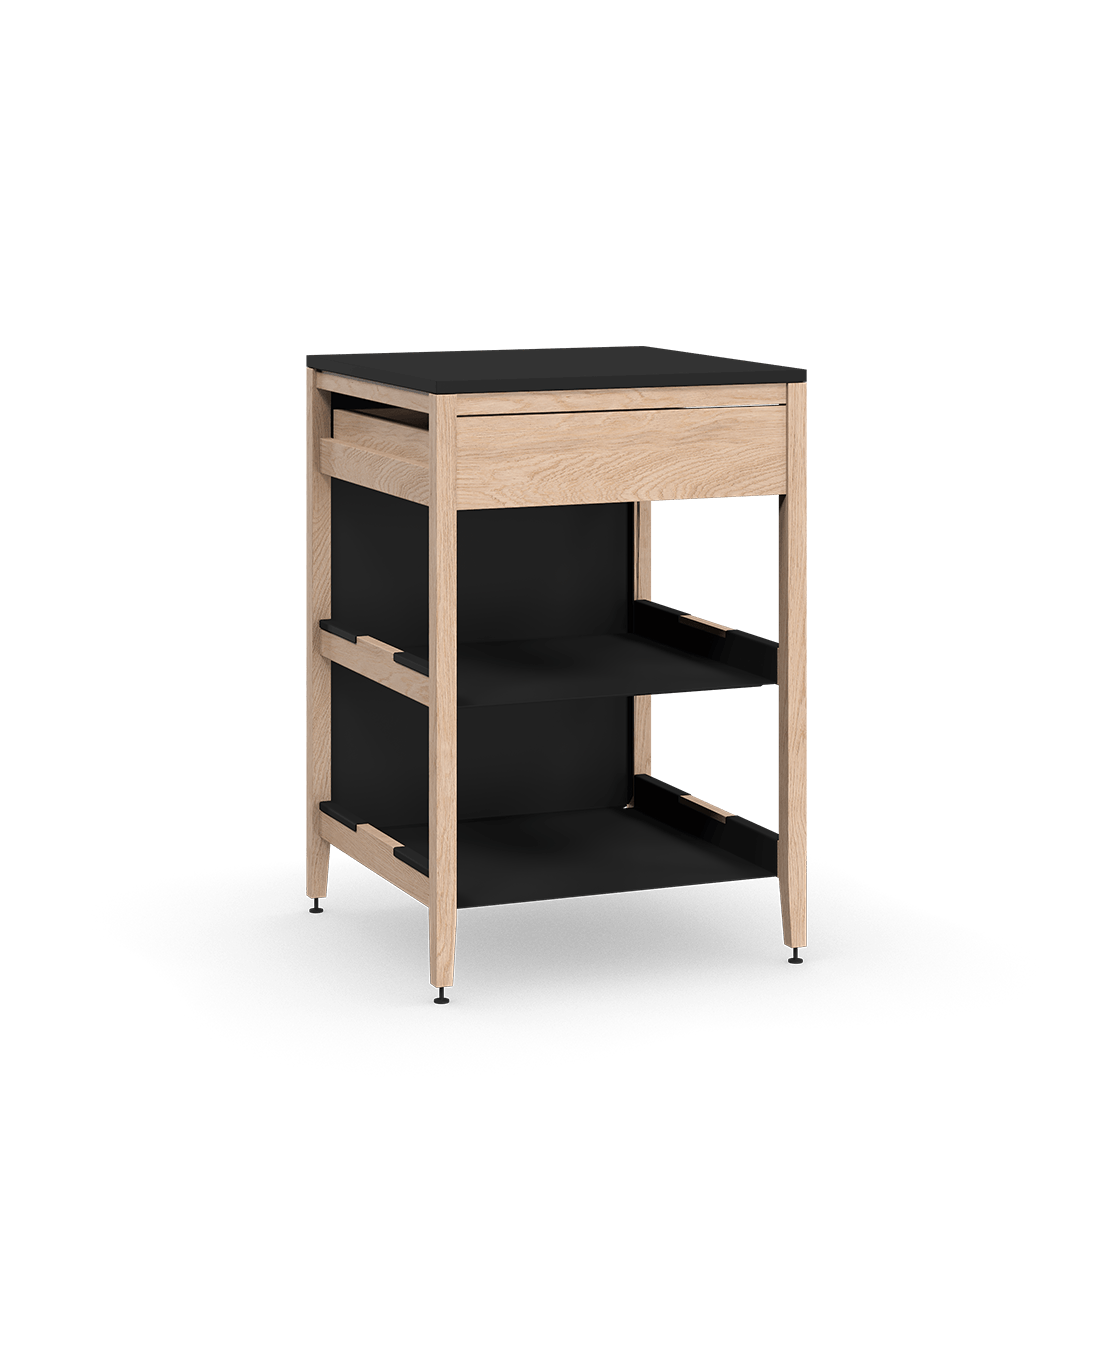 coquo radix white oak solid wood modular 2 shelves 1 drawer base kitchen cabinet 27 inch C1-C-27TB-1022-NA